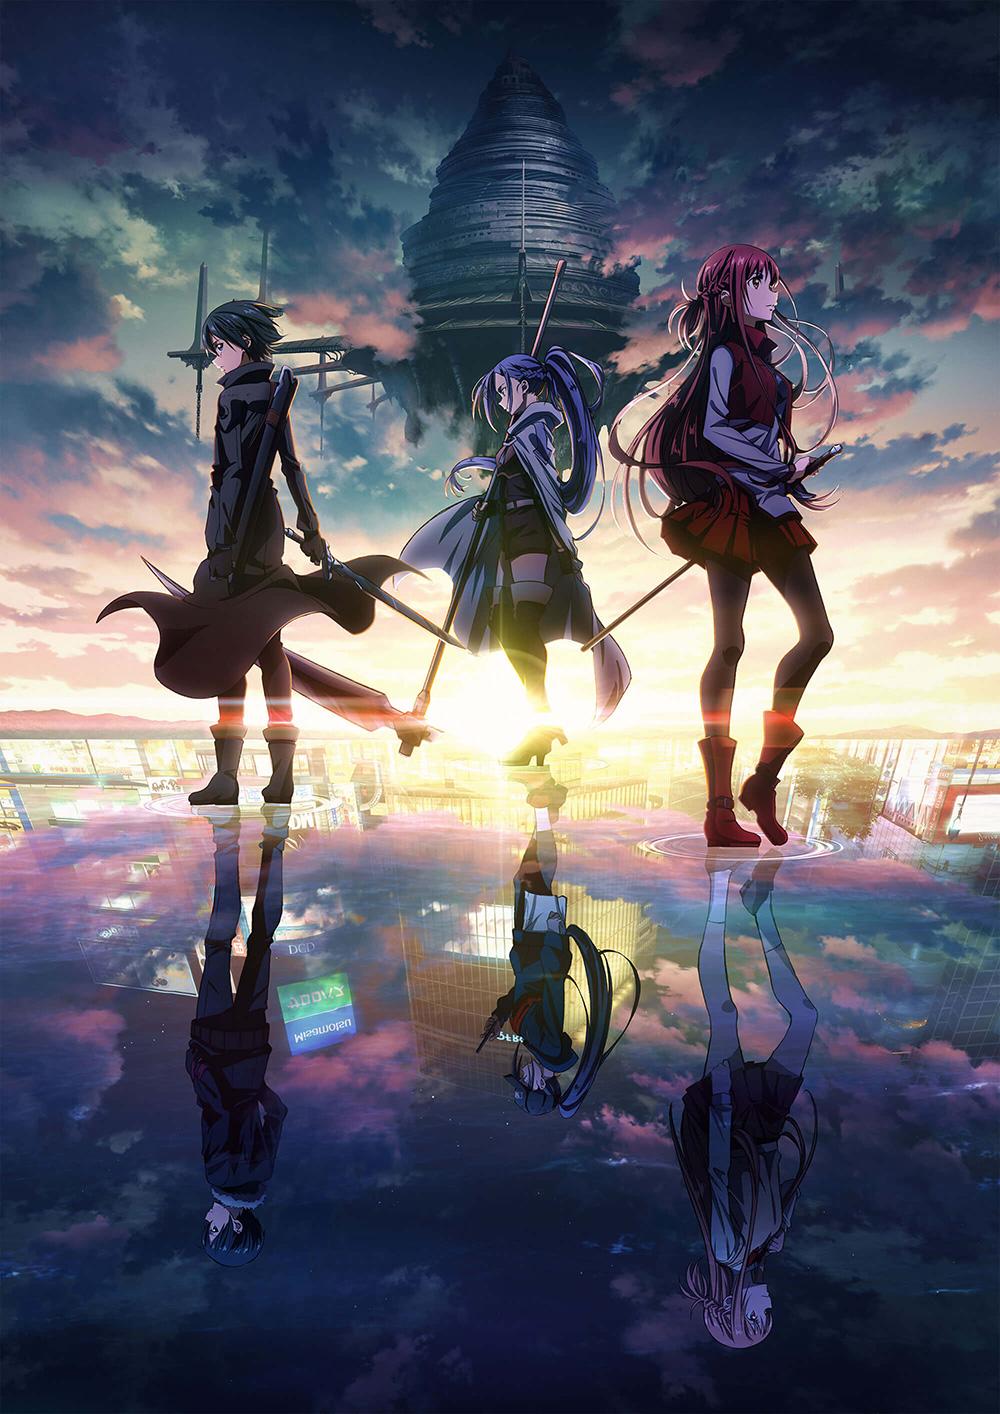 Sword-Art-Online-Progressive-Aria-of-a-Starless-Night-Visual-03